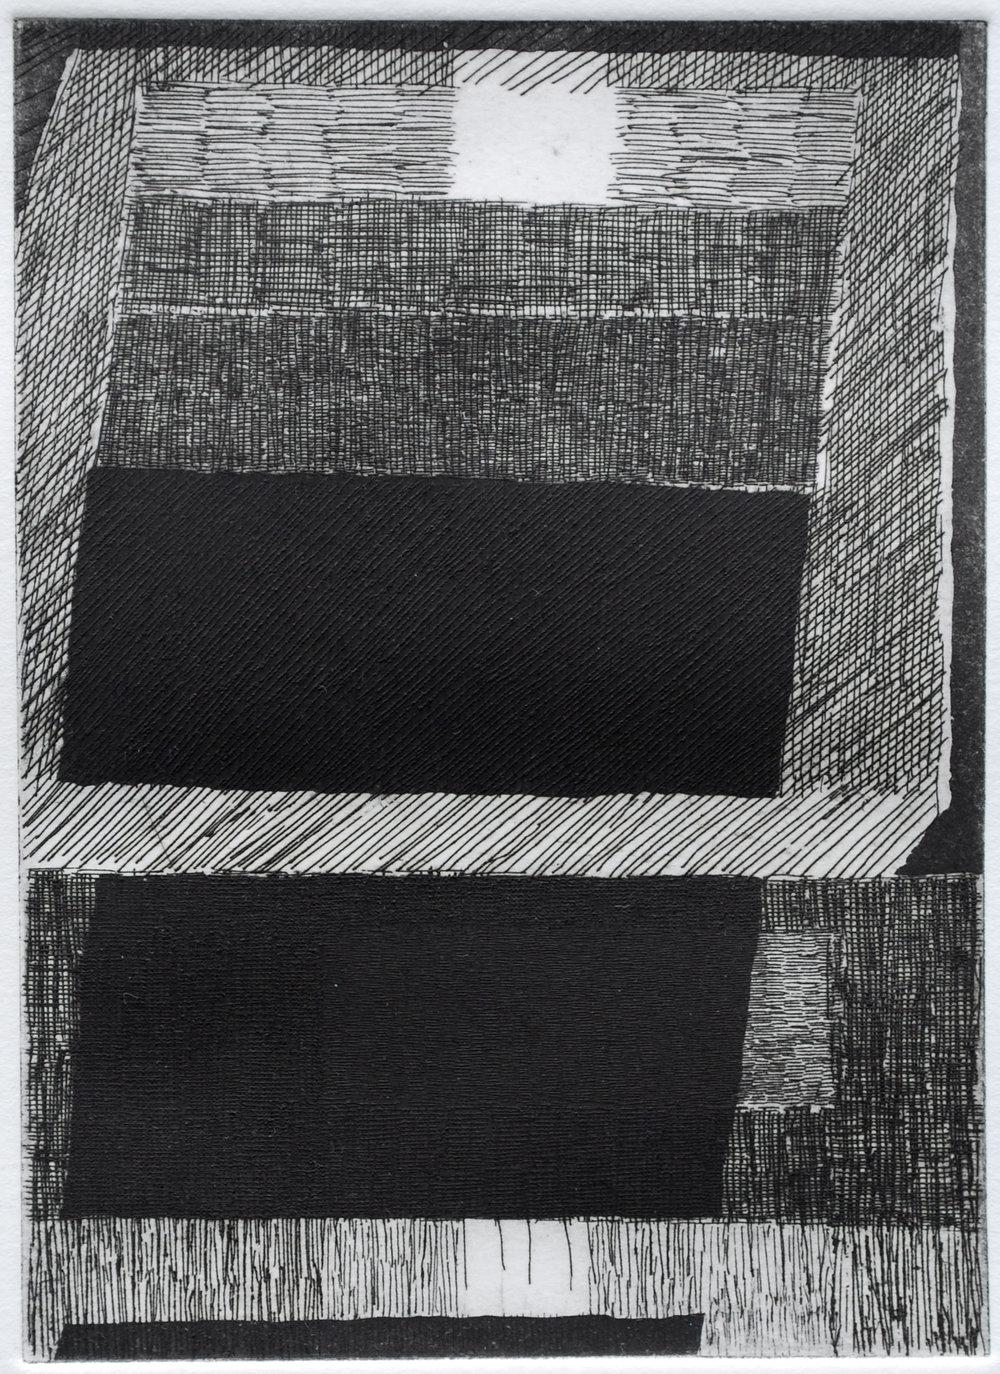 etching, 7 x 5, 2017